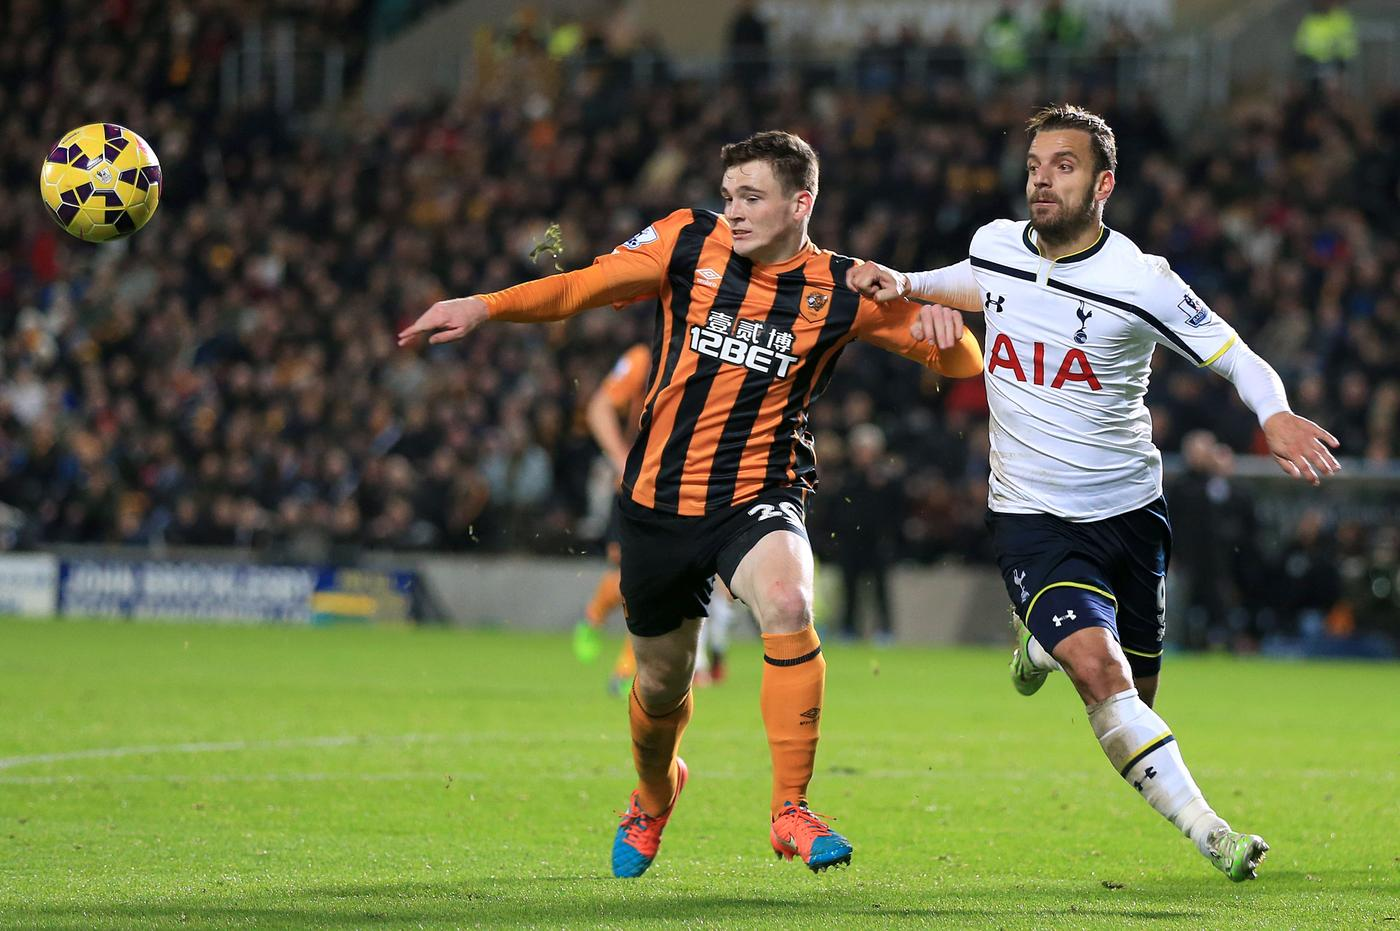 Hull City 'slap £30m transfer fee on Arsenal target Andrew Robertson'